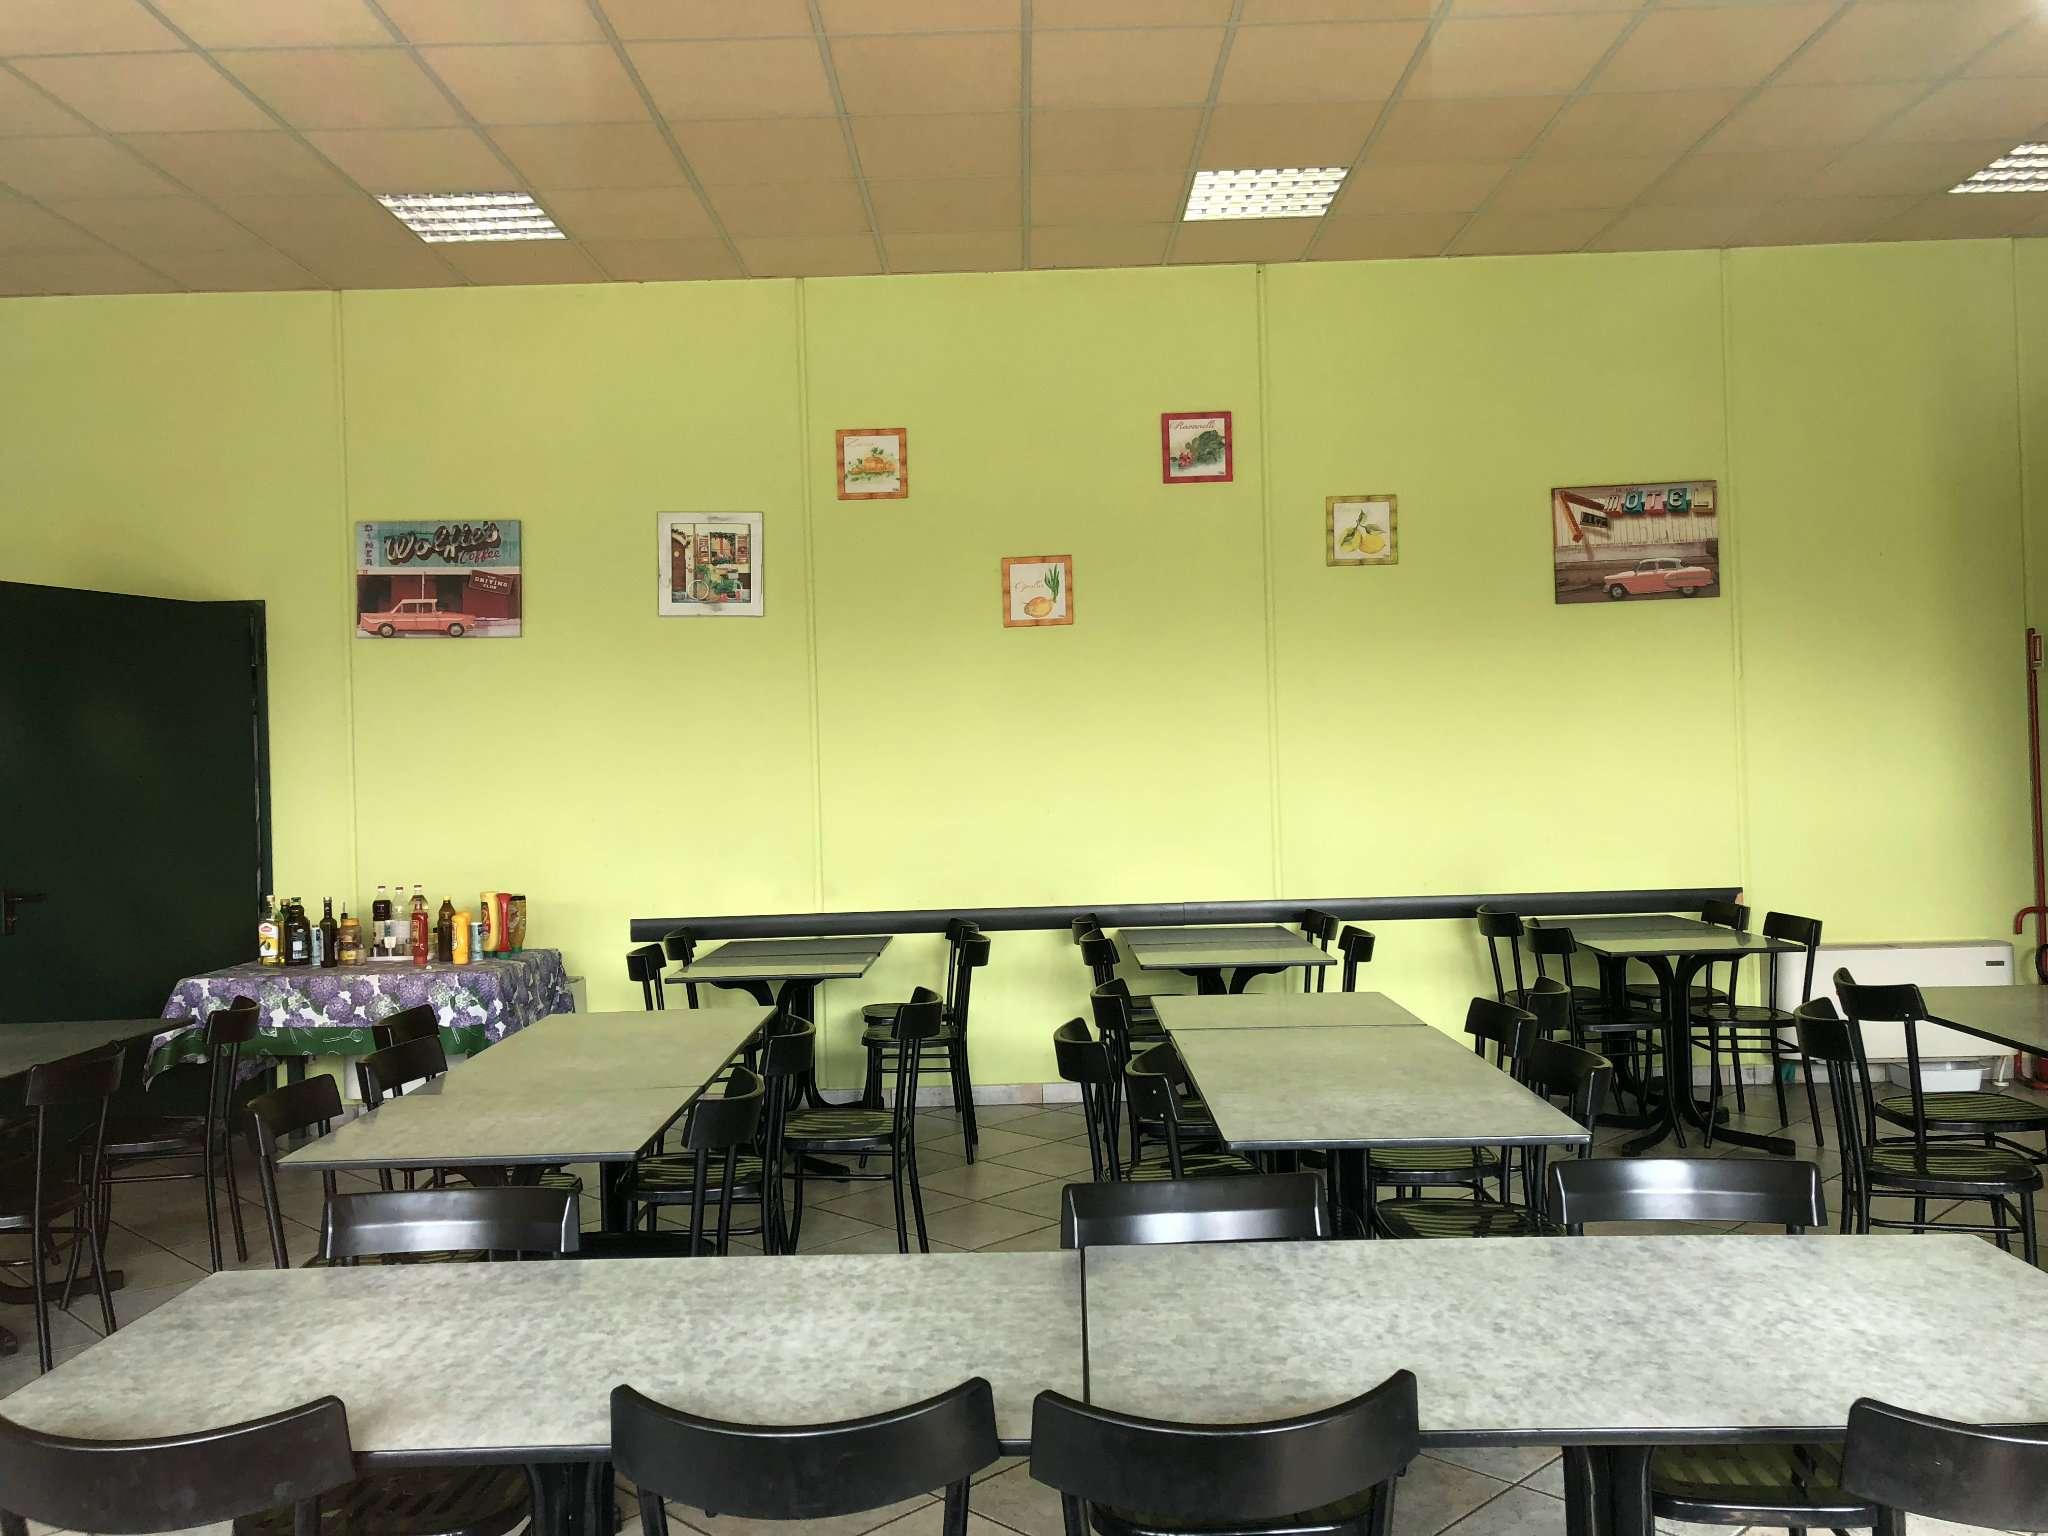 Ristorante / Pizzeria / Trattoria in vendita a Bricherasio, 4 locali, Trattative riservate | CambioCasa.it